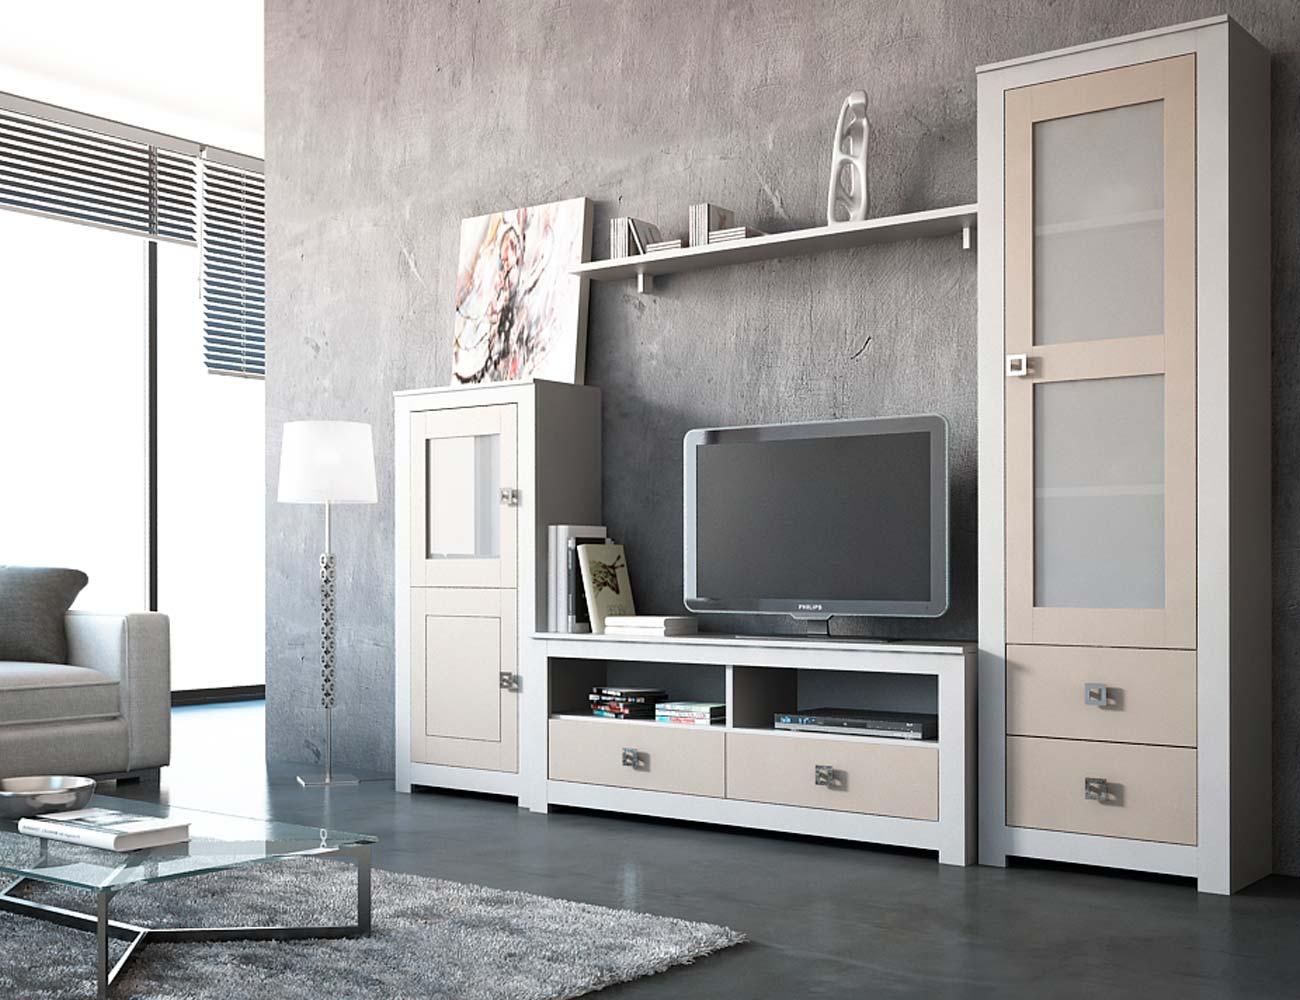 2 mueble salon modular lacado blanco piedra madera dm